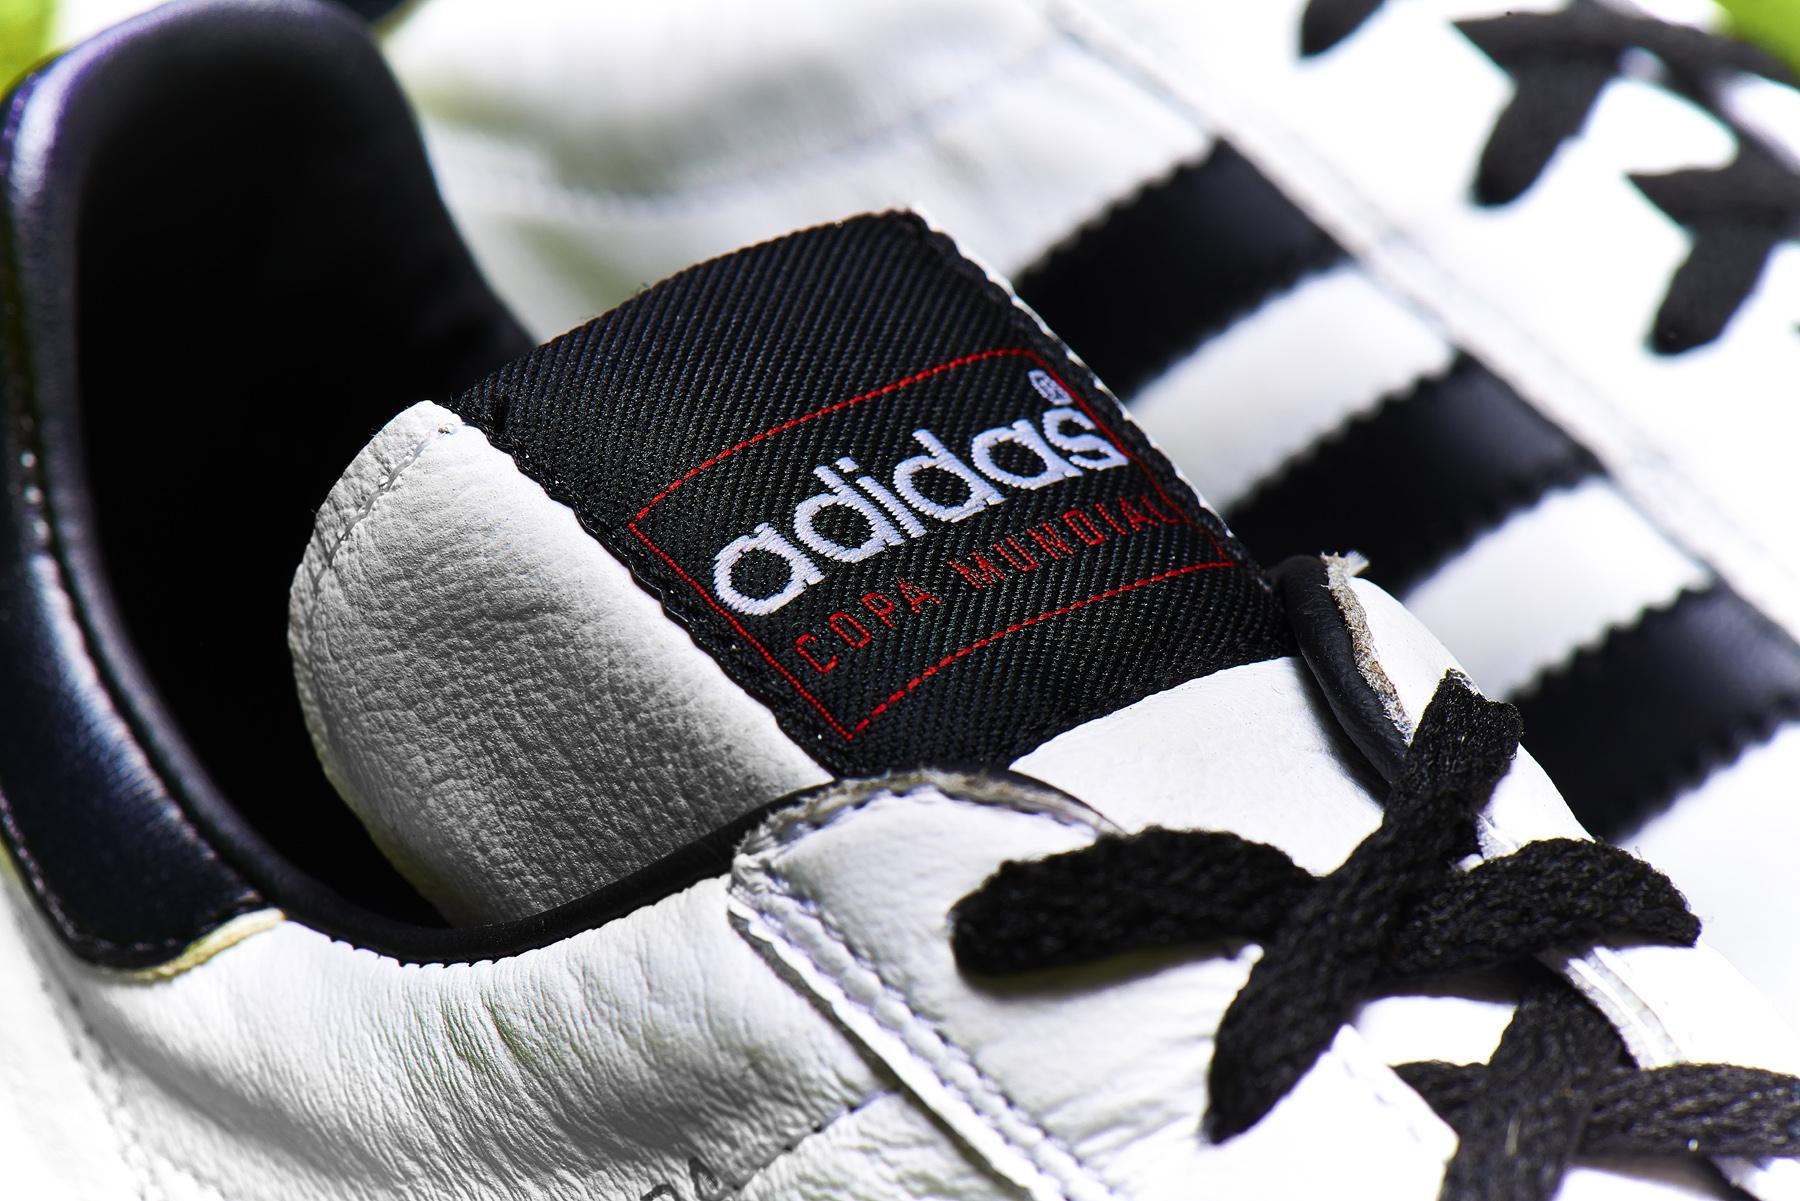 AJS_Adidas_Copa Mundial Pile_01_0319.jpg